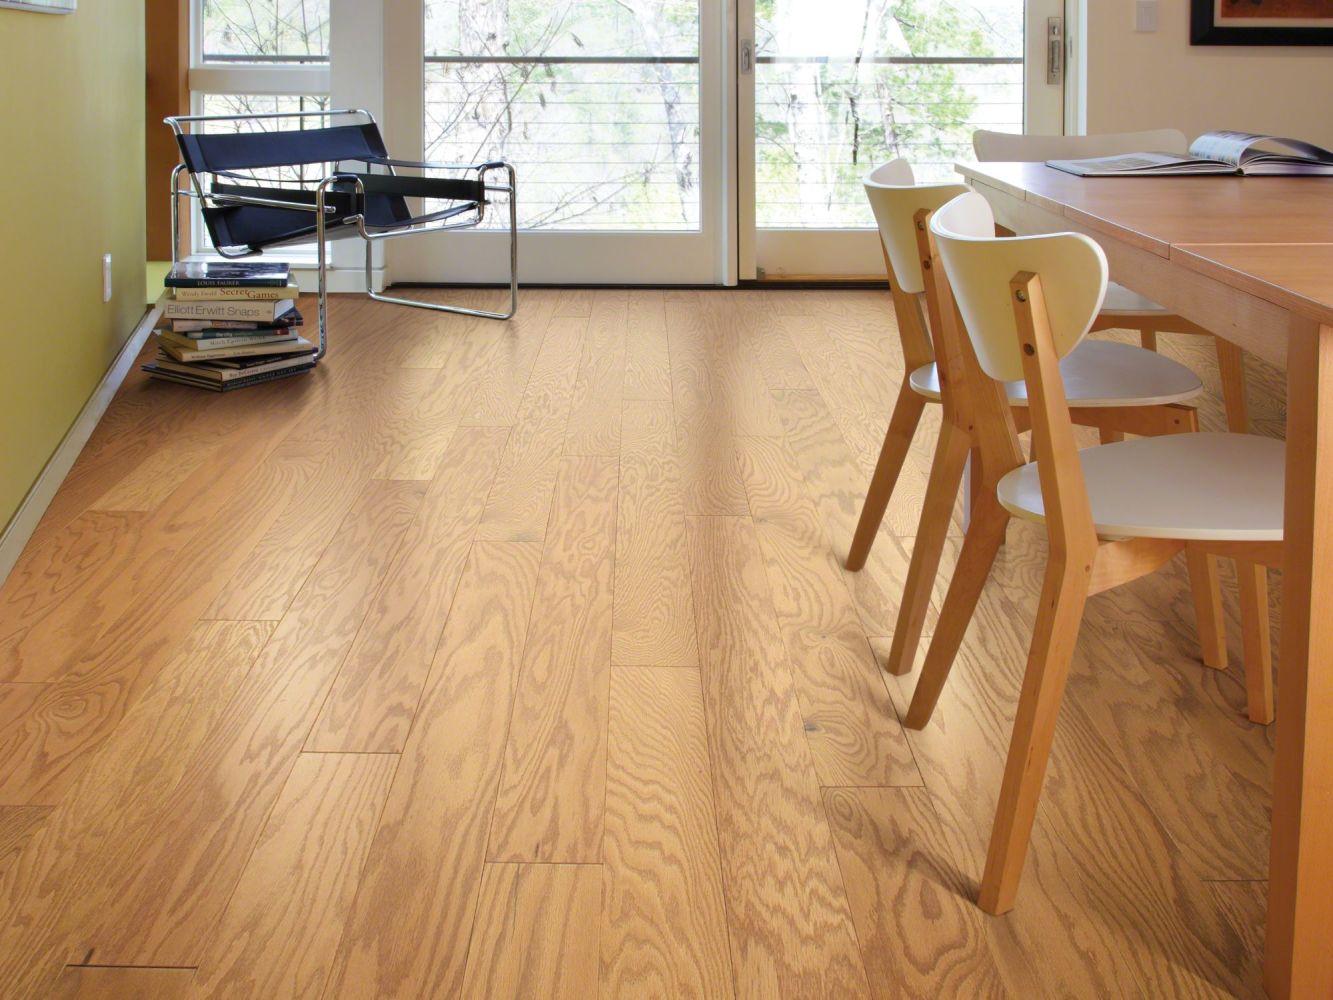 Shaw Floors Dr Horton Ann Arbor 5 Caramel 00223_DR668